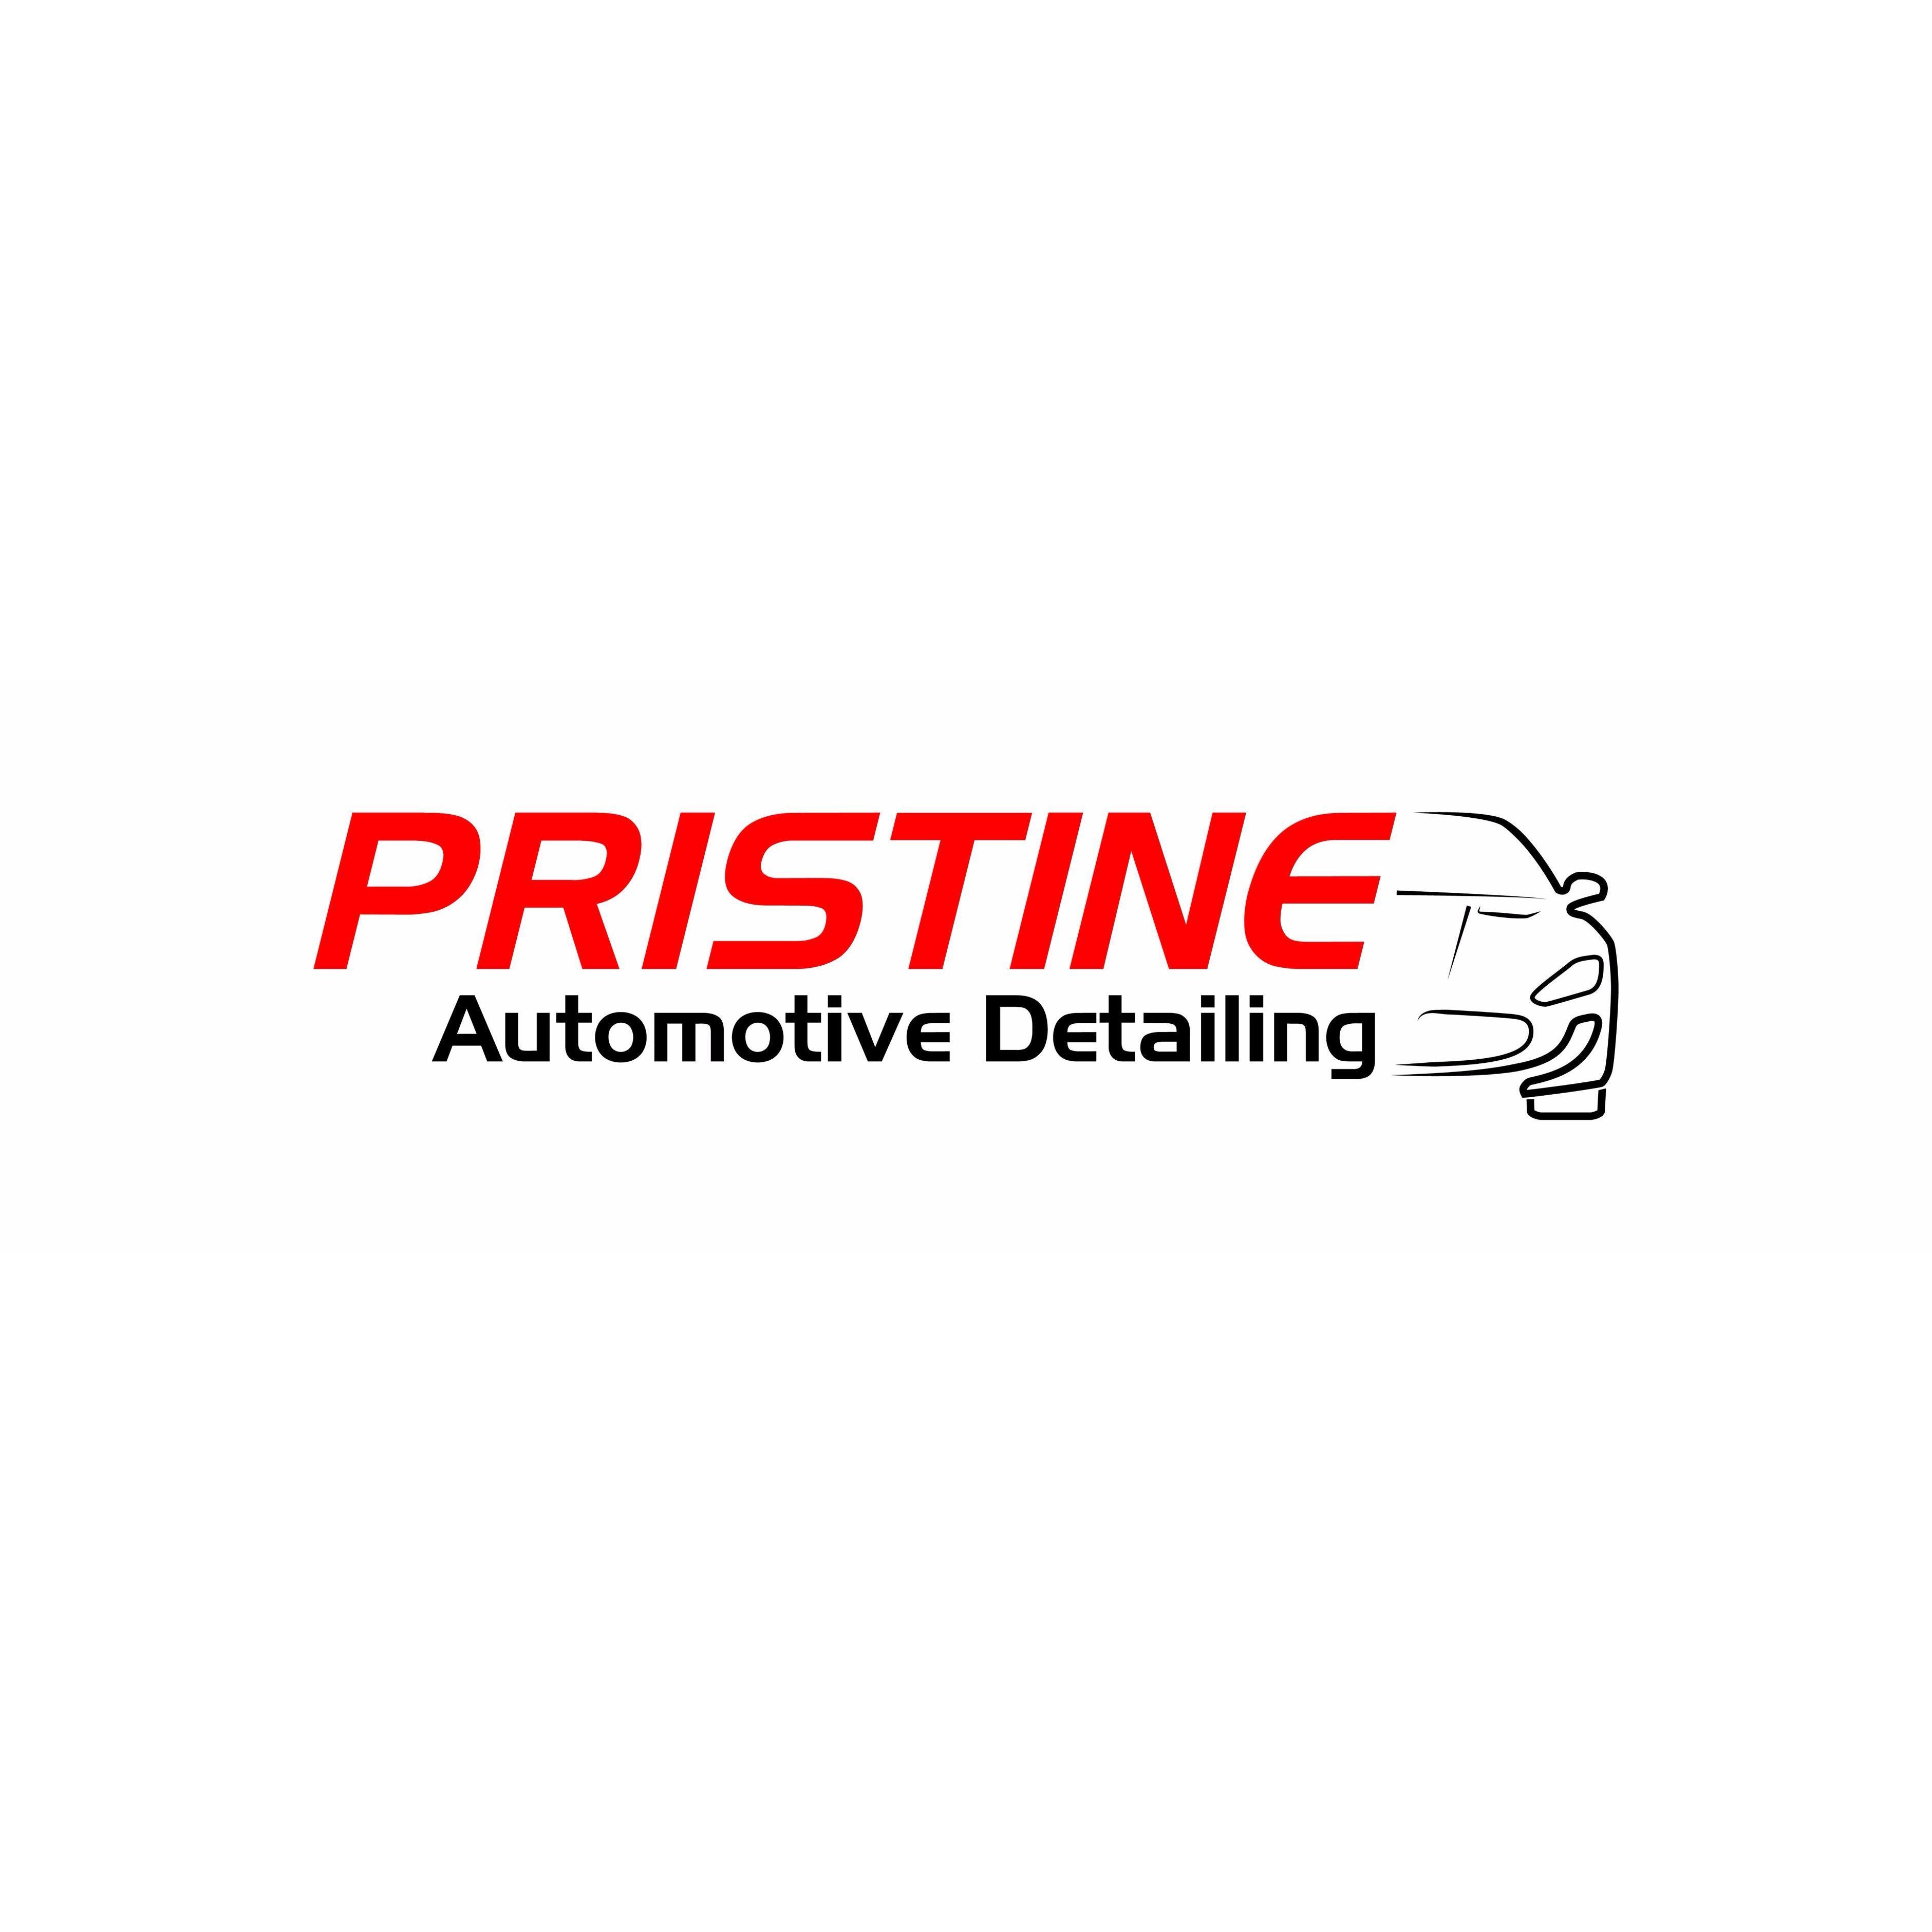 Pristine Automotive Detailing